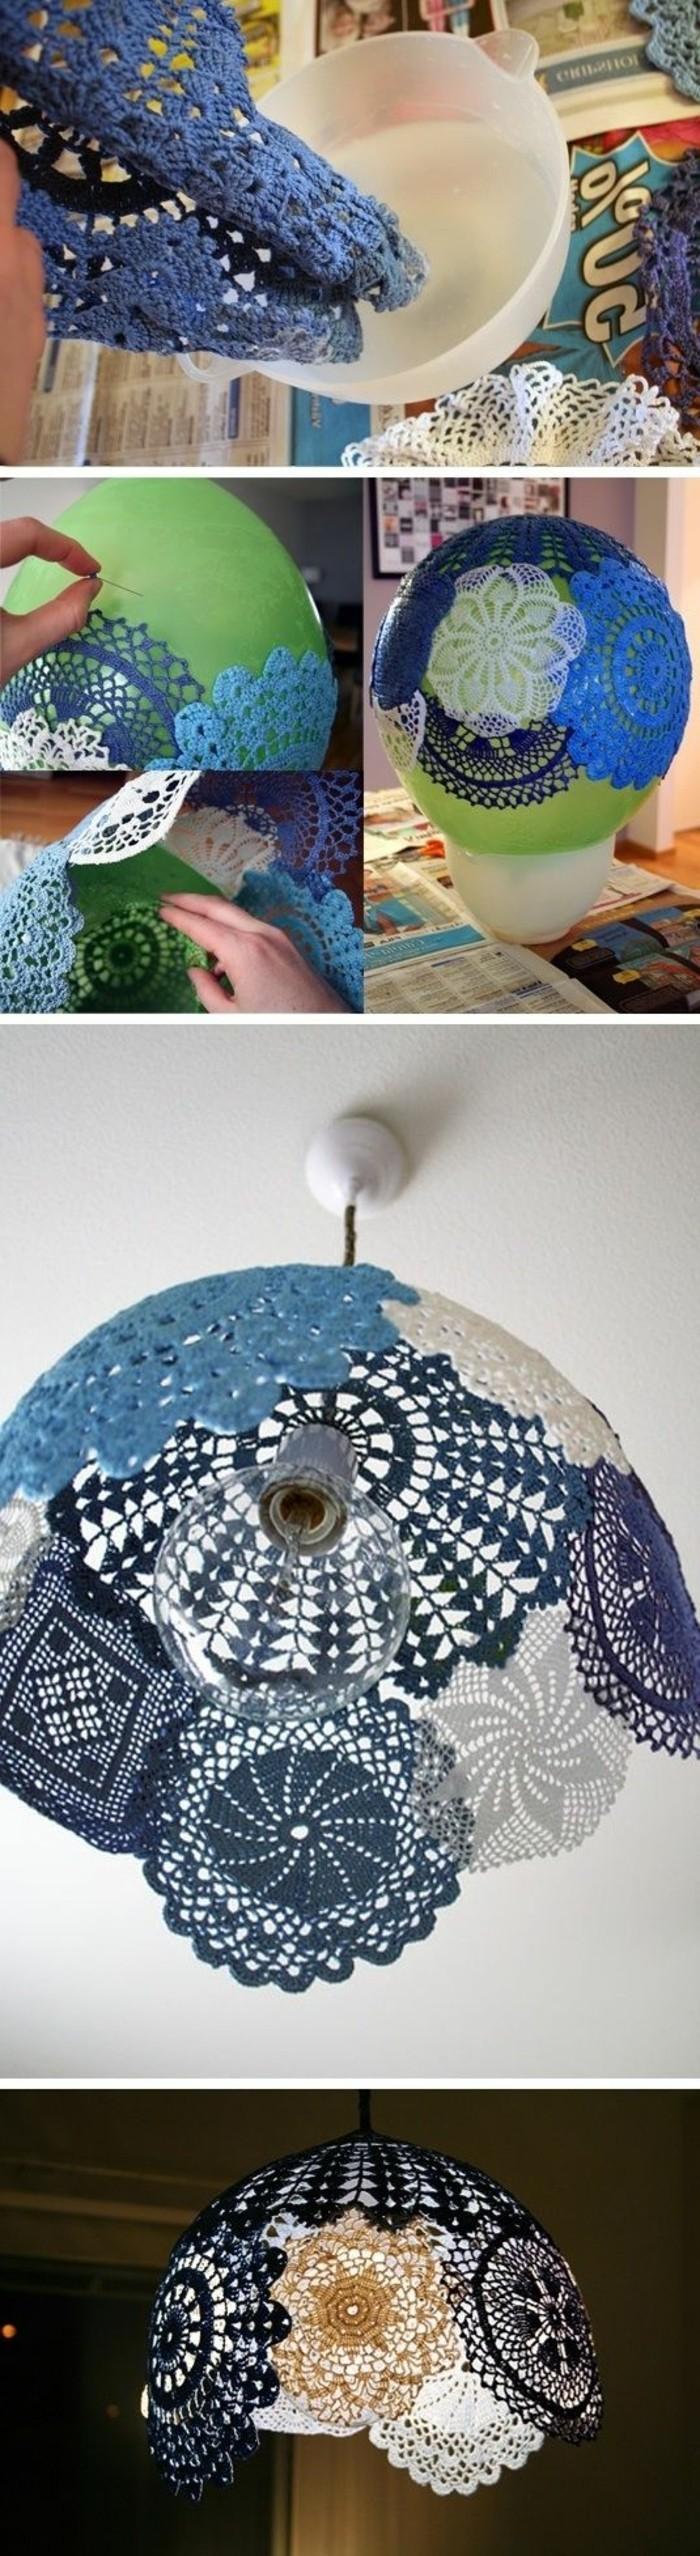 lampenschirm-basteln-spitzen-kleber-balon-schale